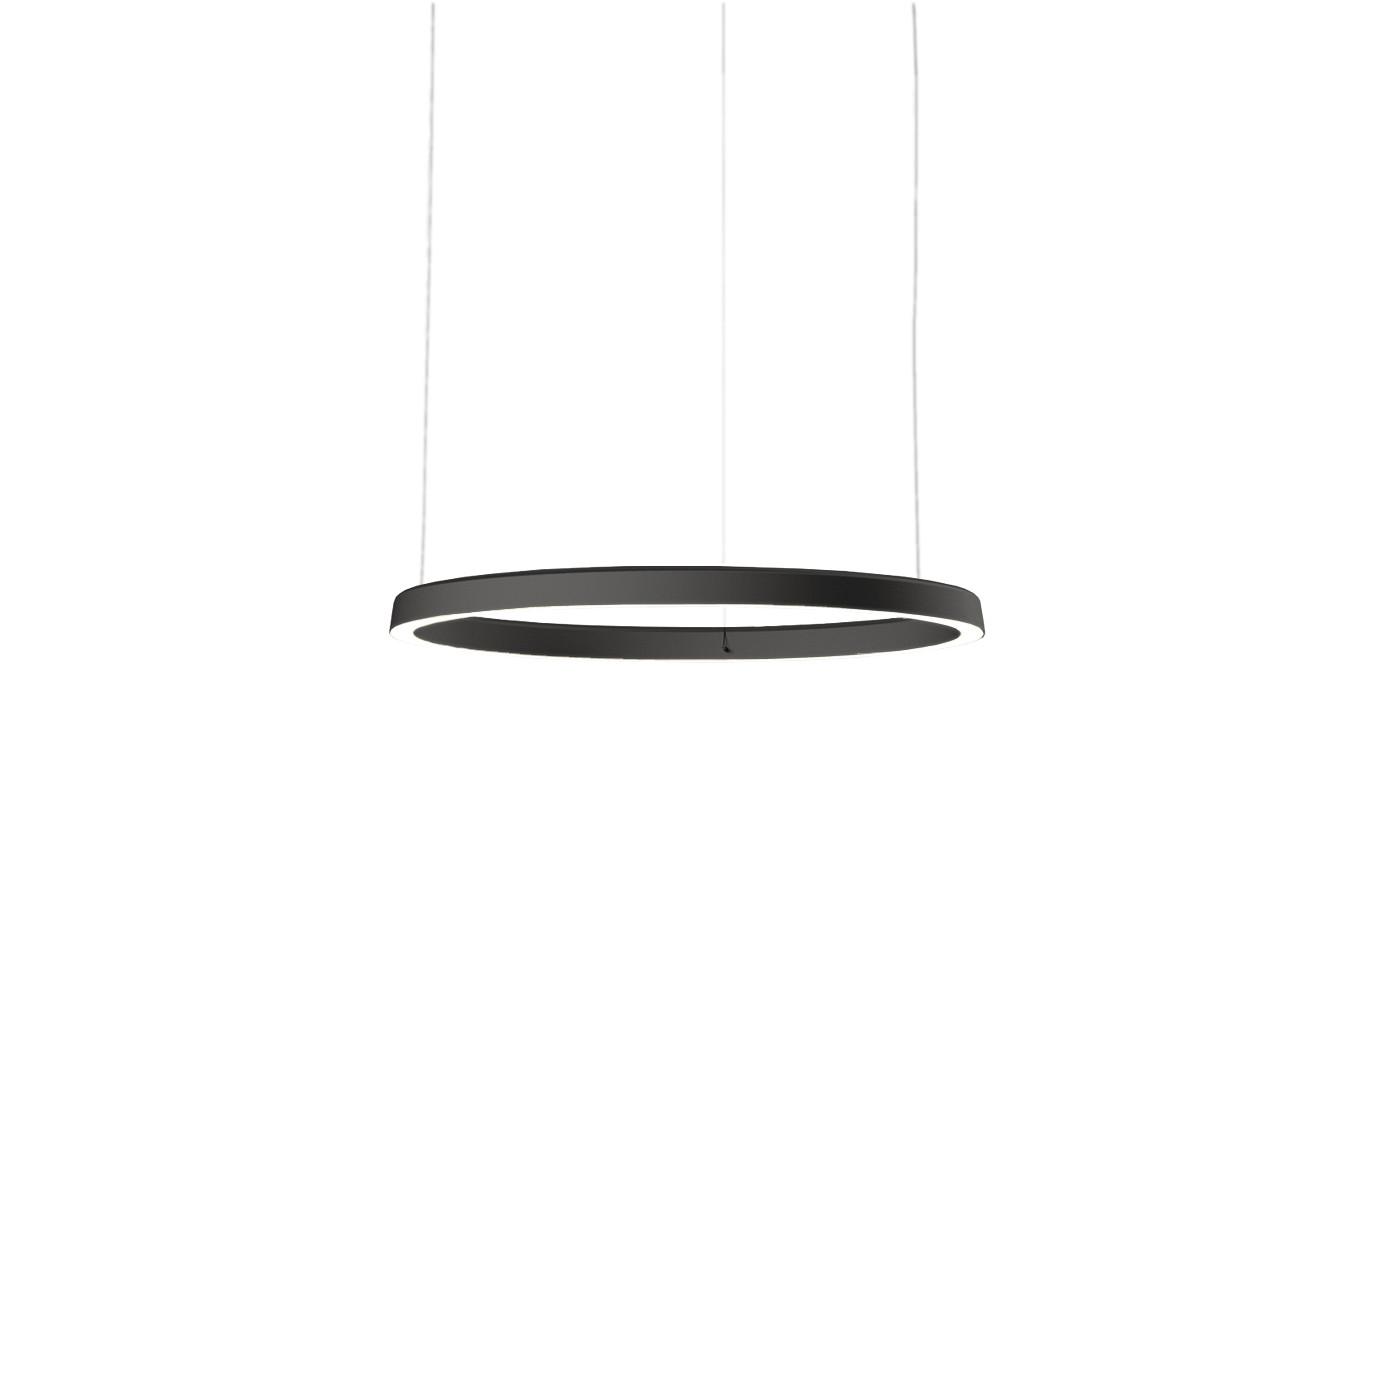 Luceplan Compendium Circle 72 LED